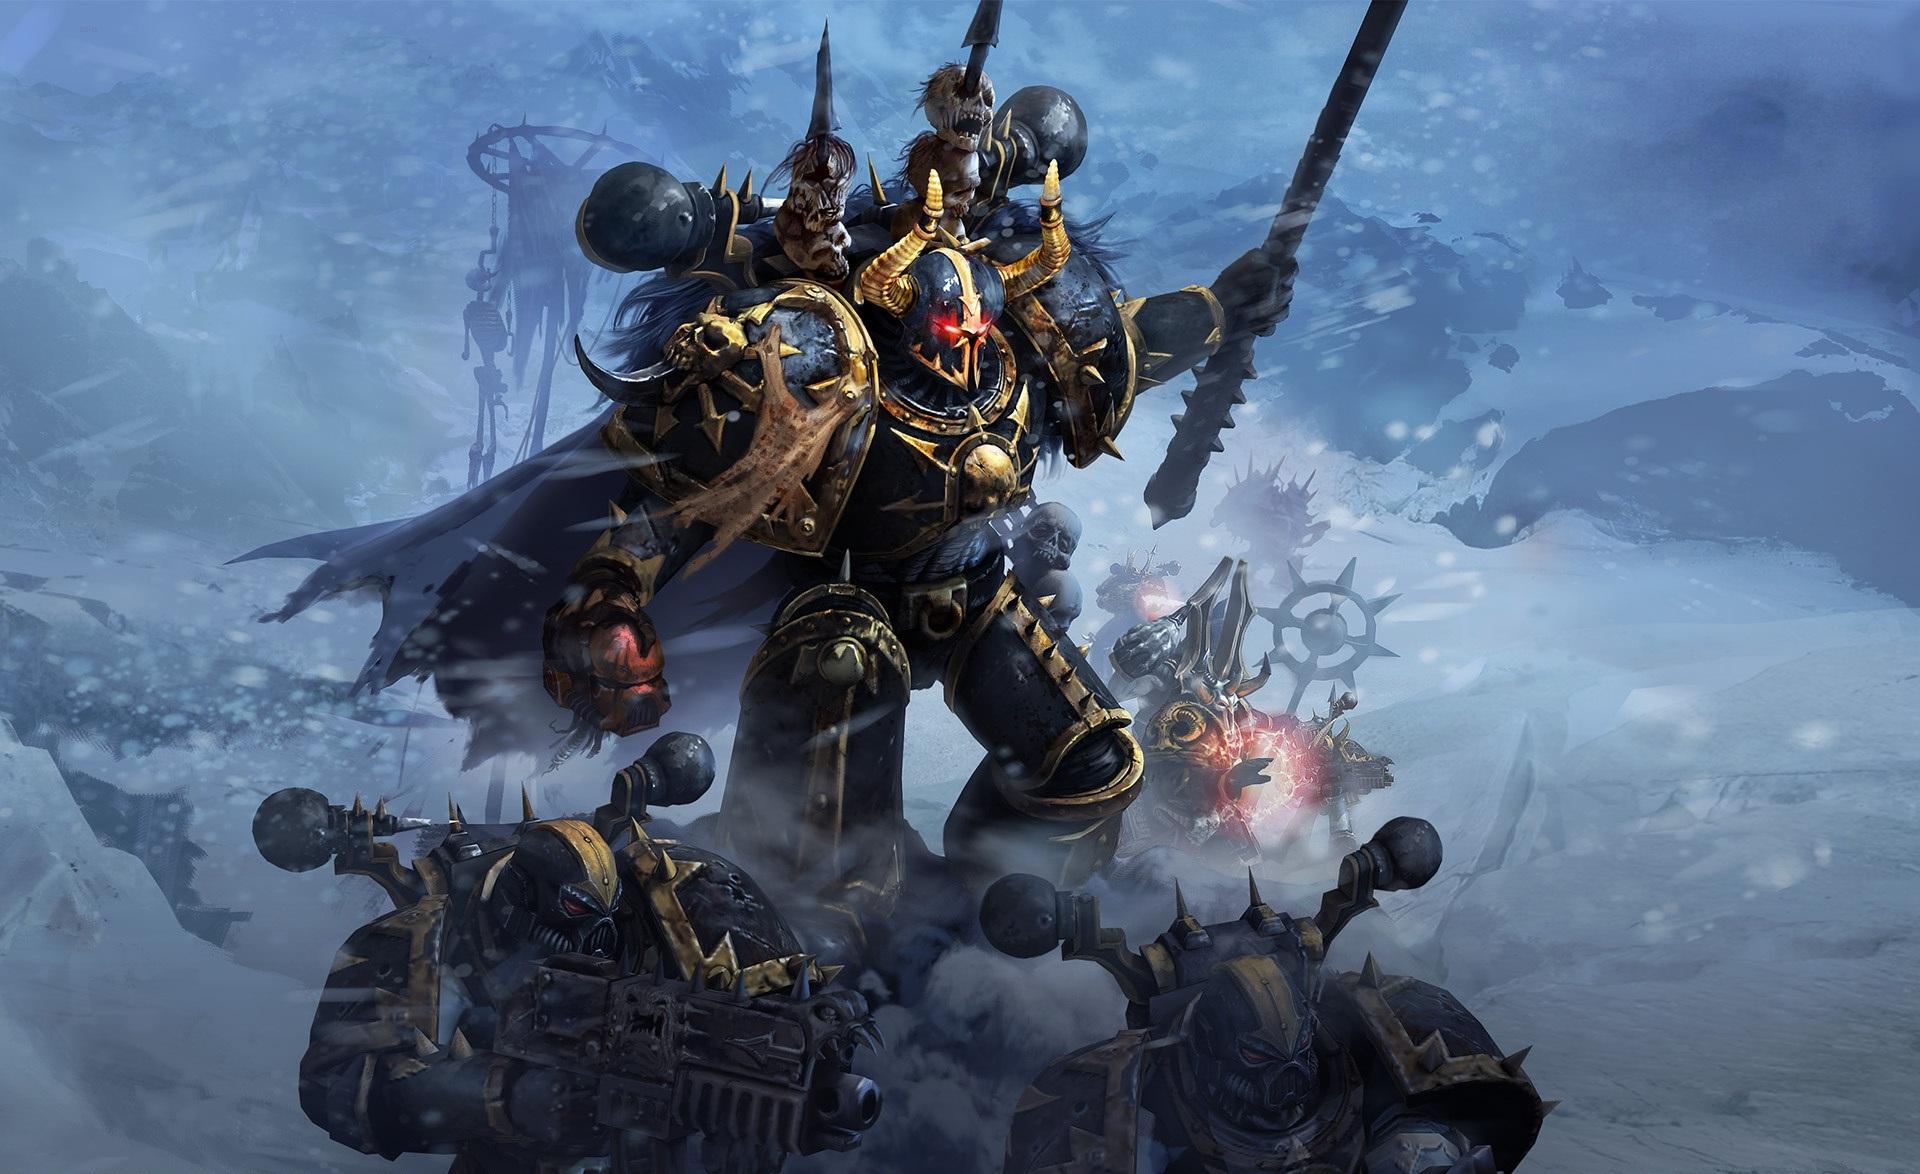 Warhammer 40000 dawn of war 2 chaos rising wallpaper 01